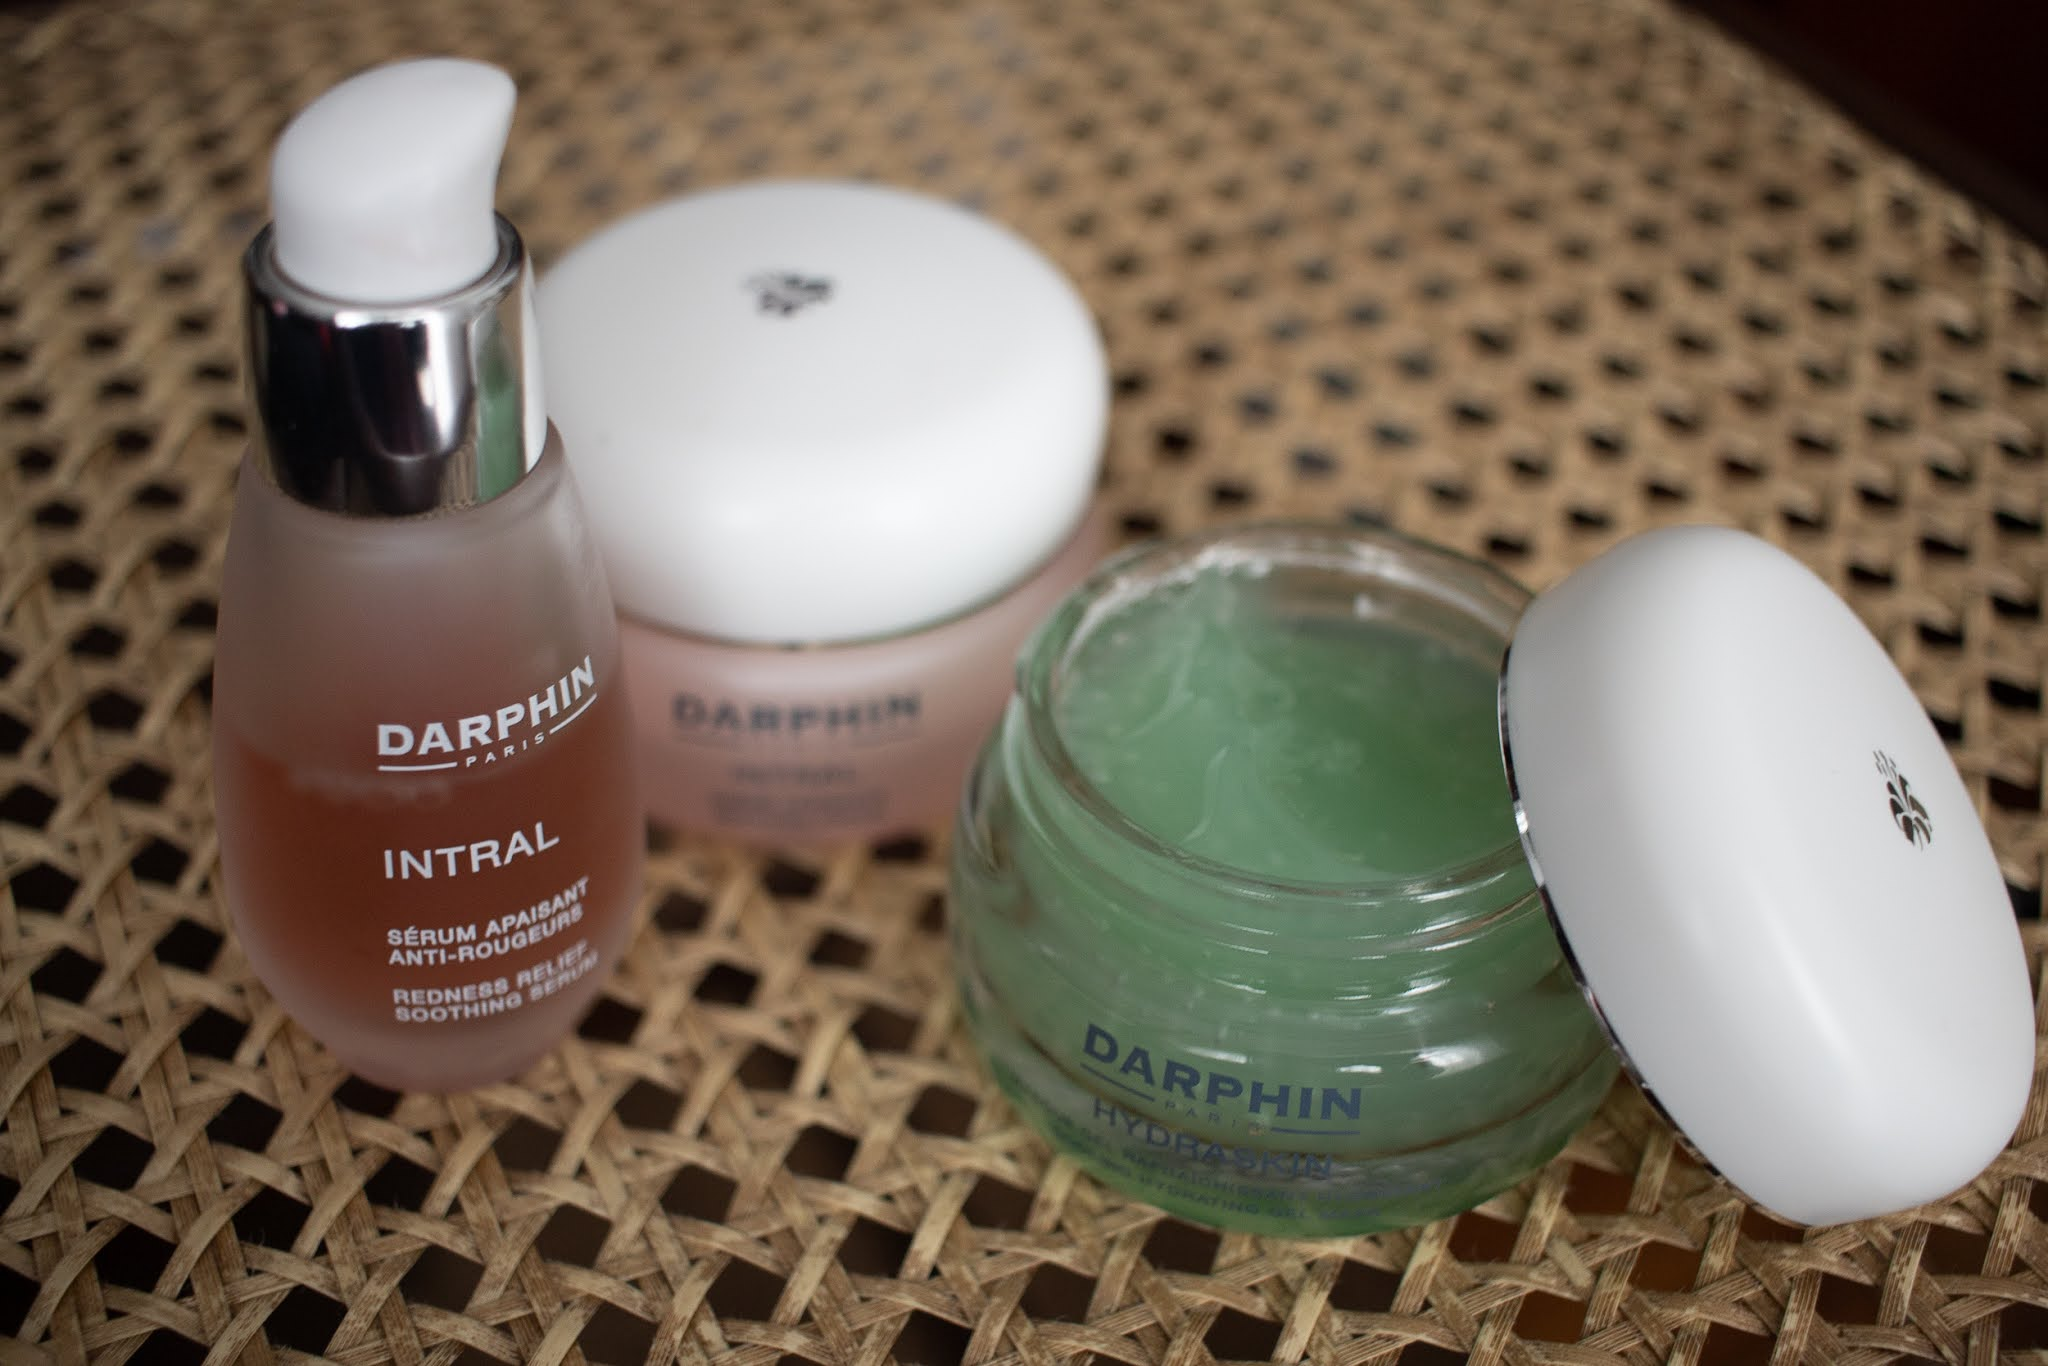 Darphin Intral & Hydraskin